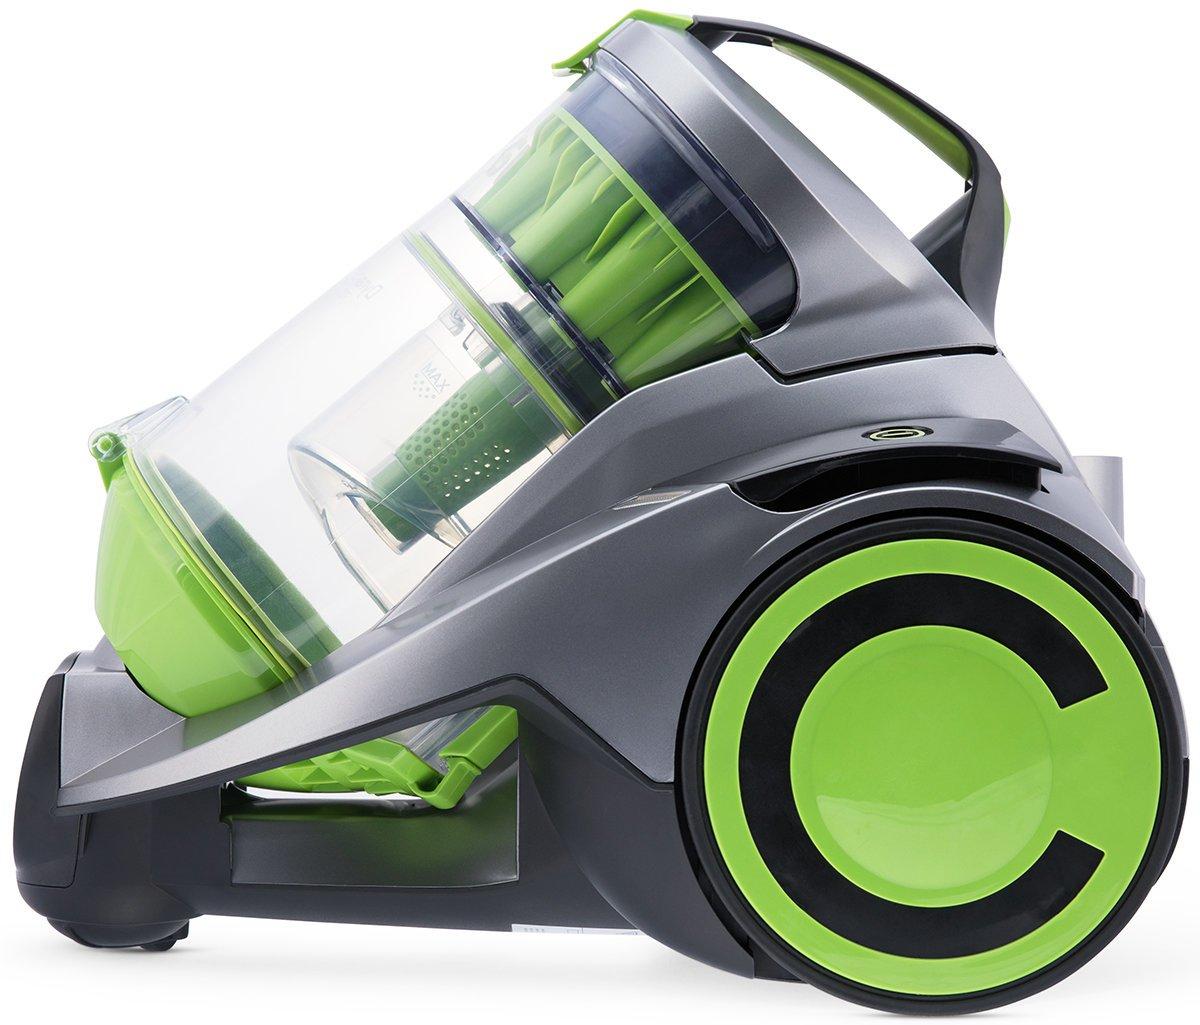 Vax VX54 Dynamo Power Total Home Vacuum Cleaner